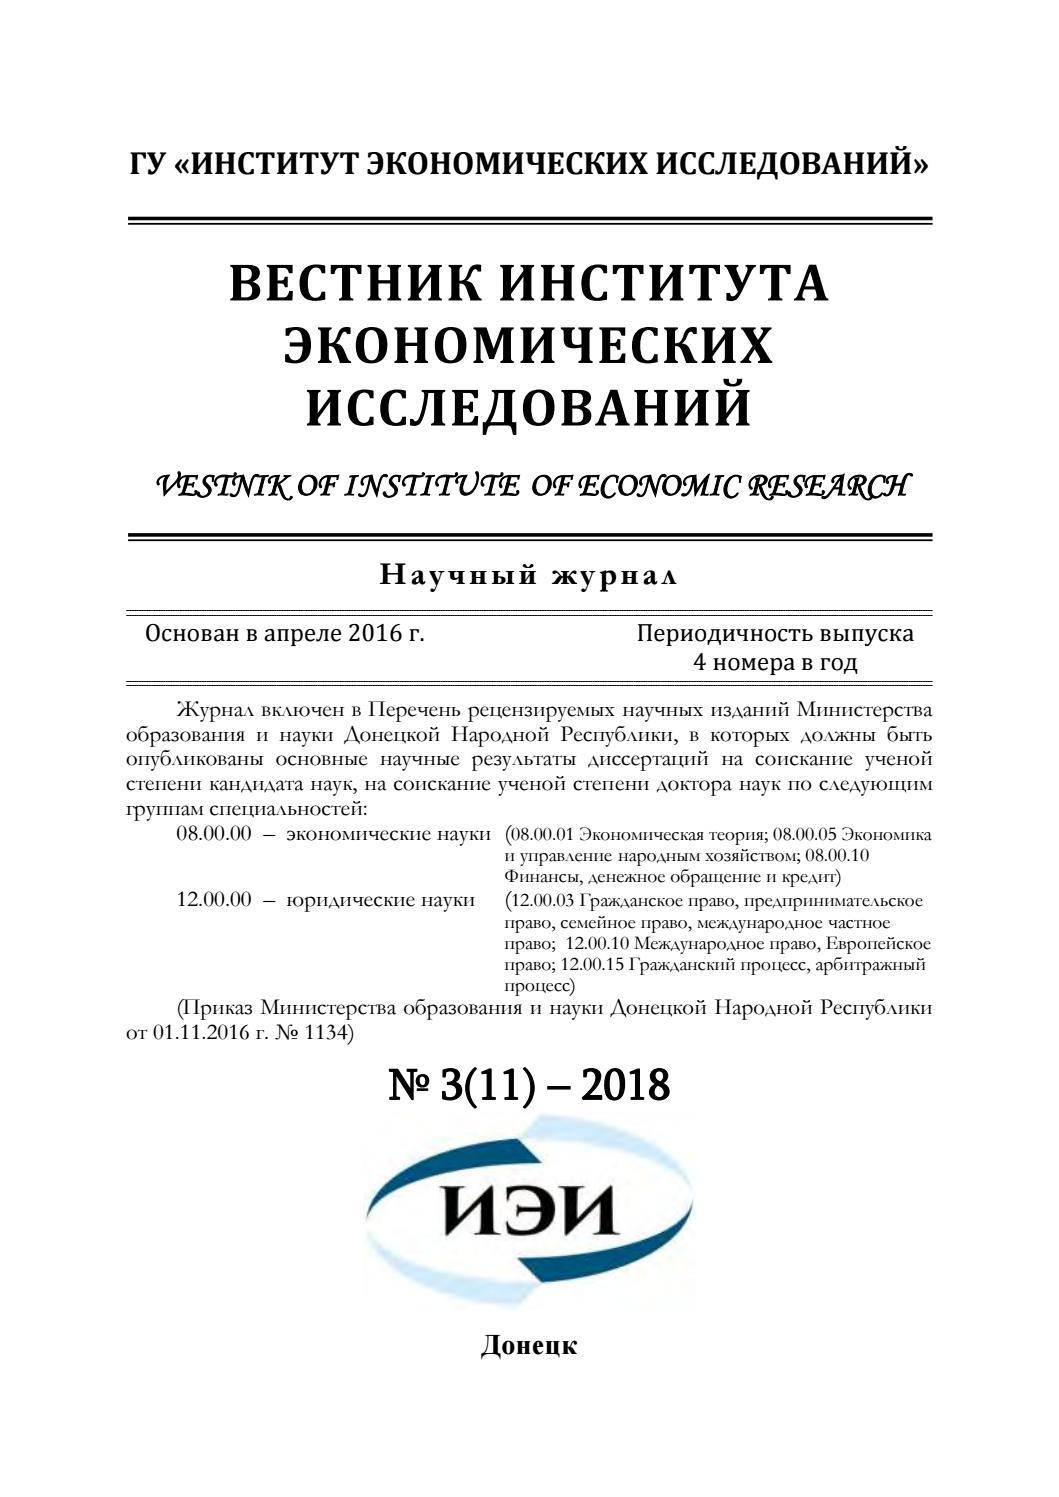 ed42f99882e 2018 № 3 (11) by Институт экономических исследований - issuu